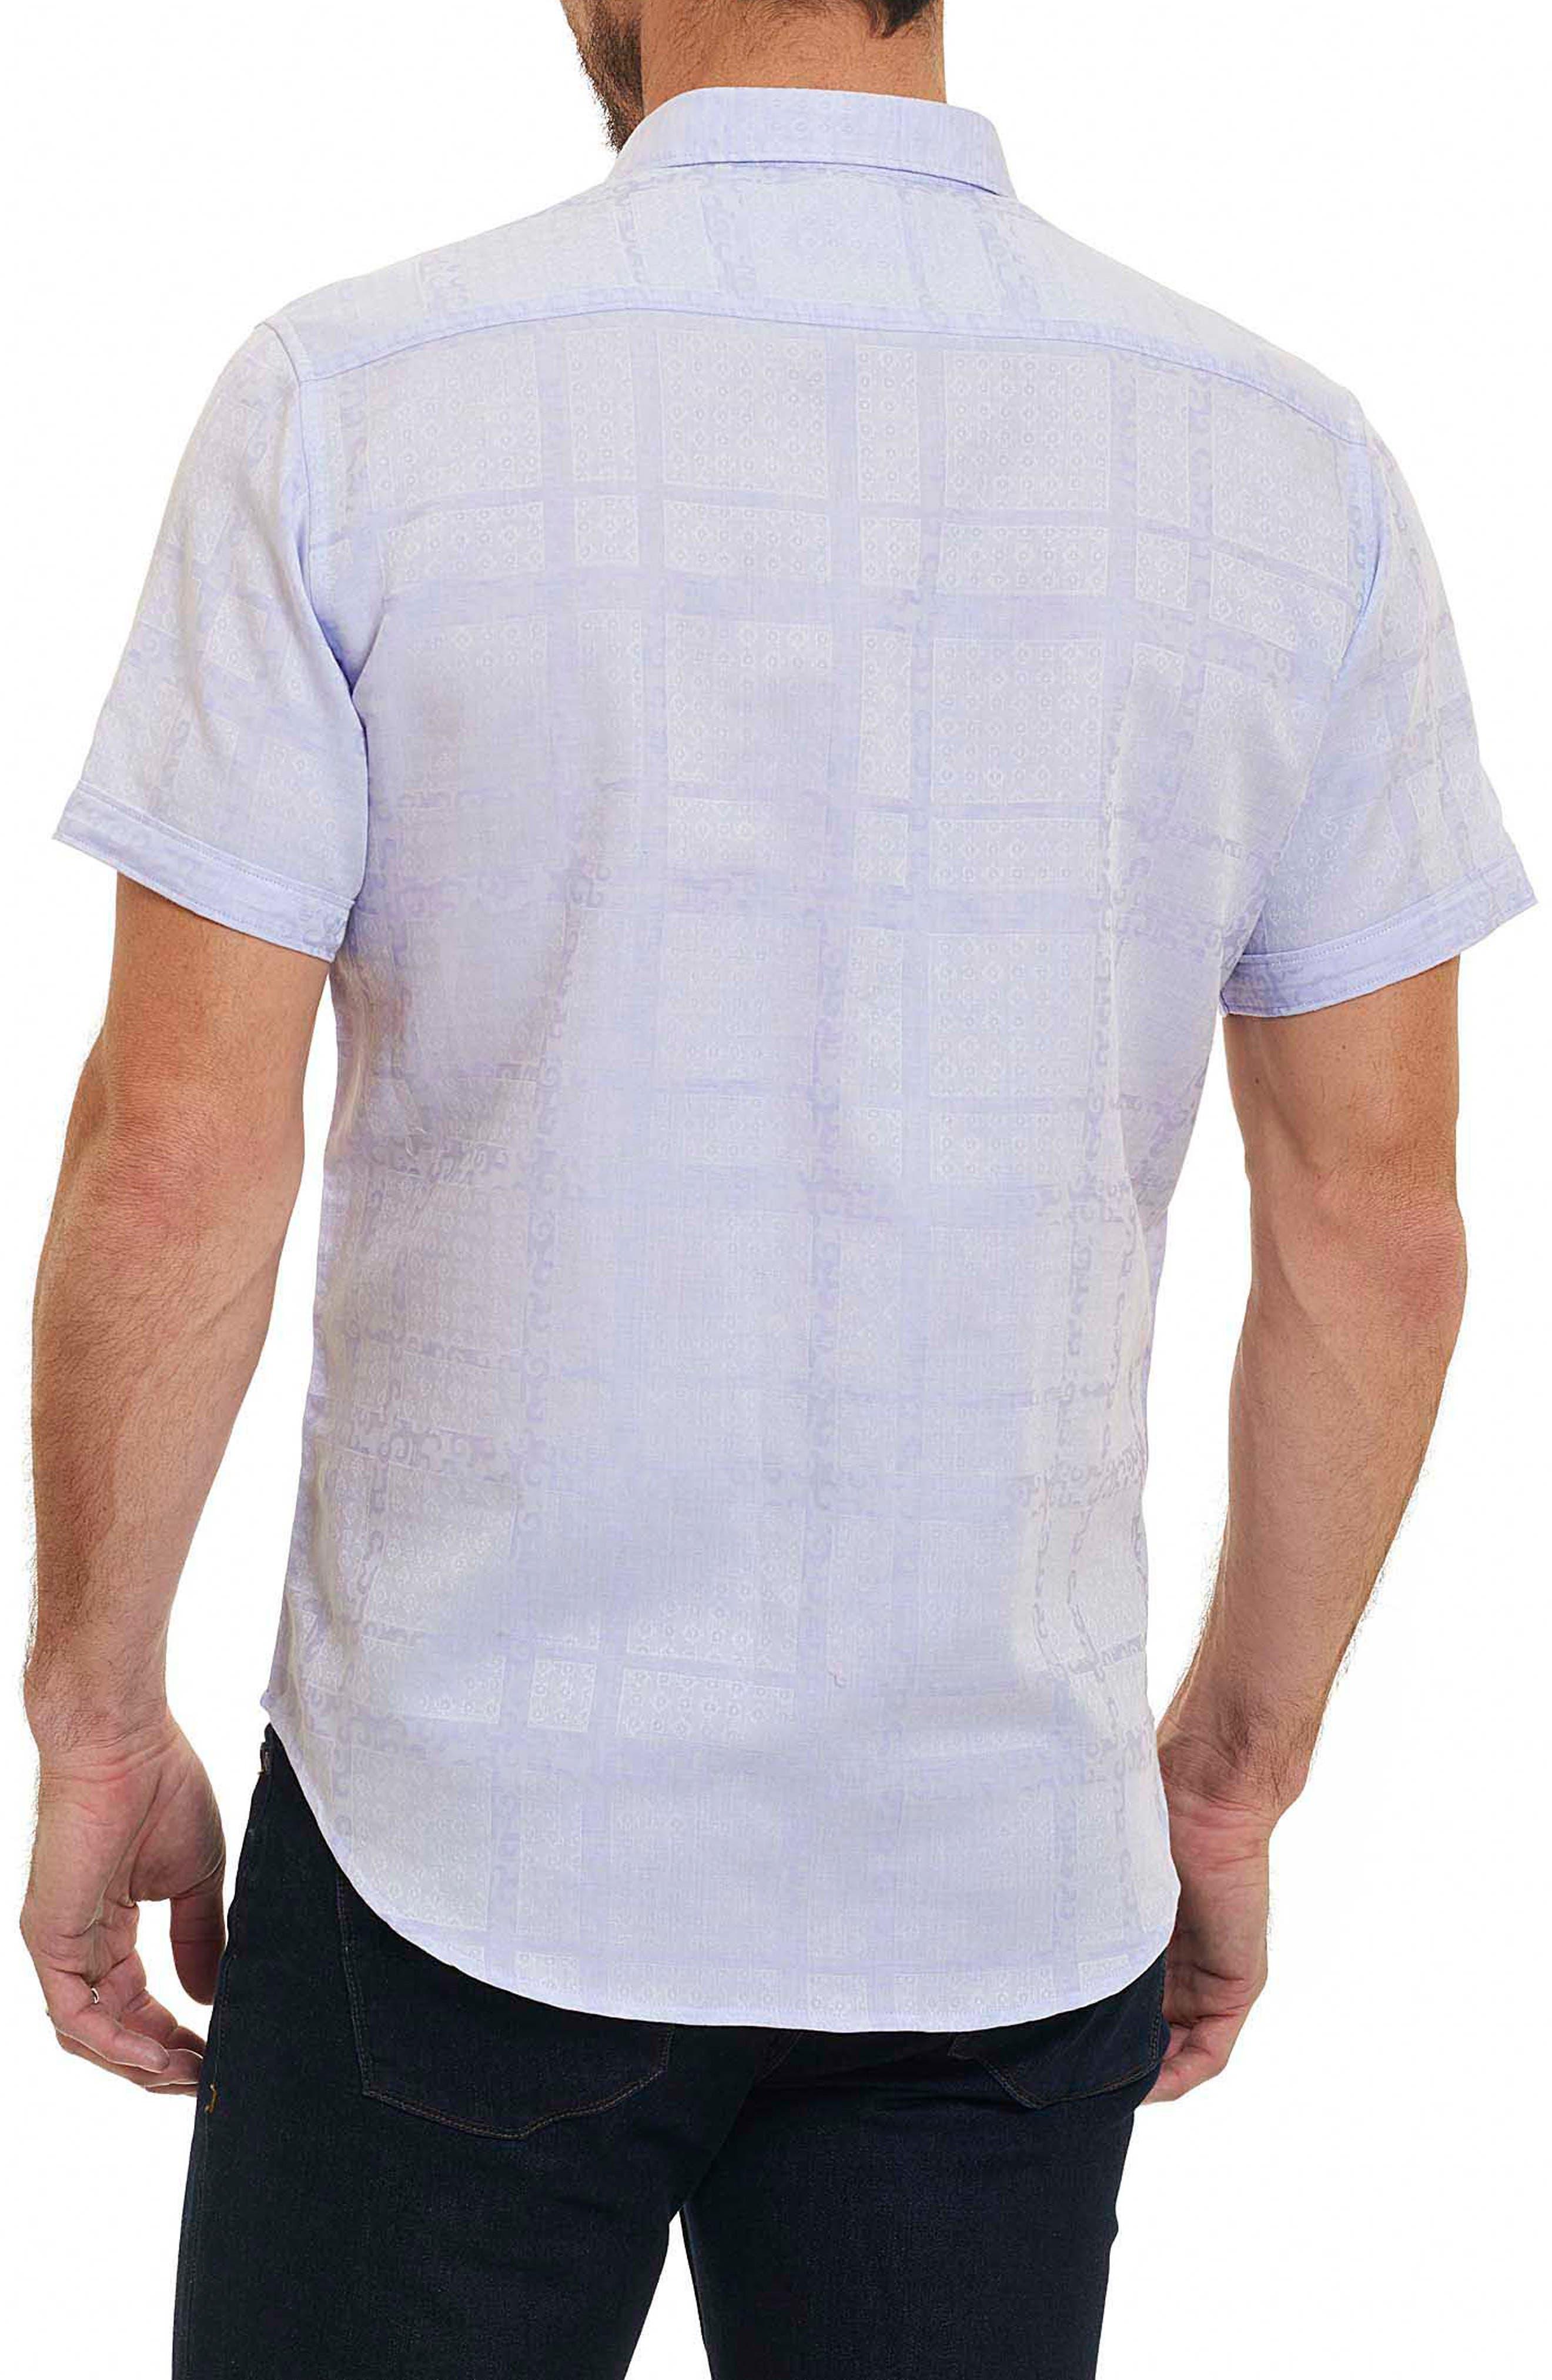 Morley Sport Shirt,                             Alternate thumbnail 2, color,                             Lilac